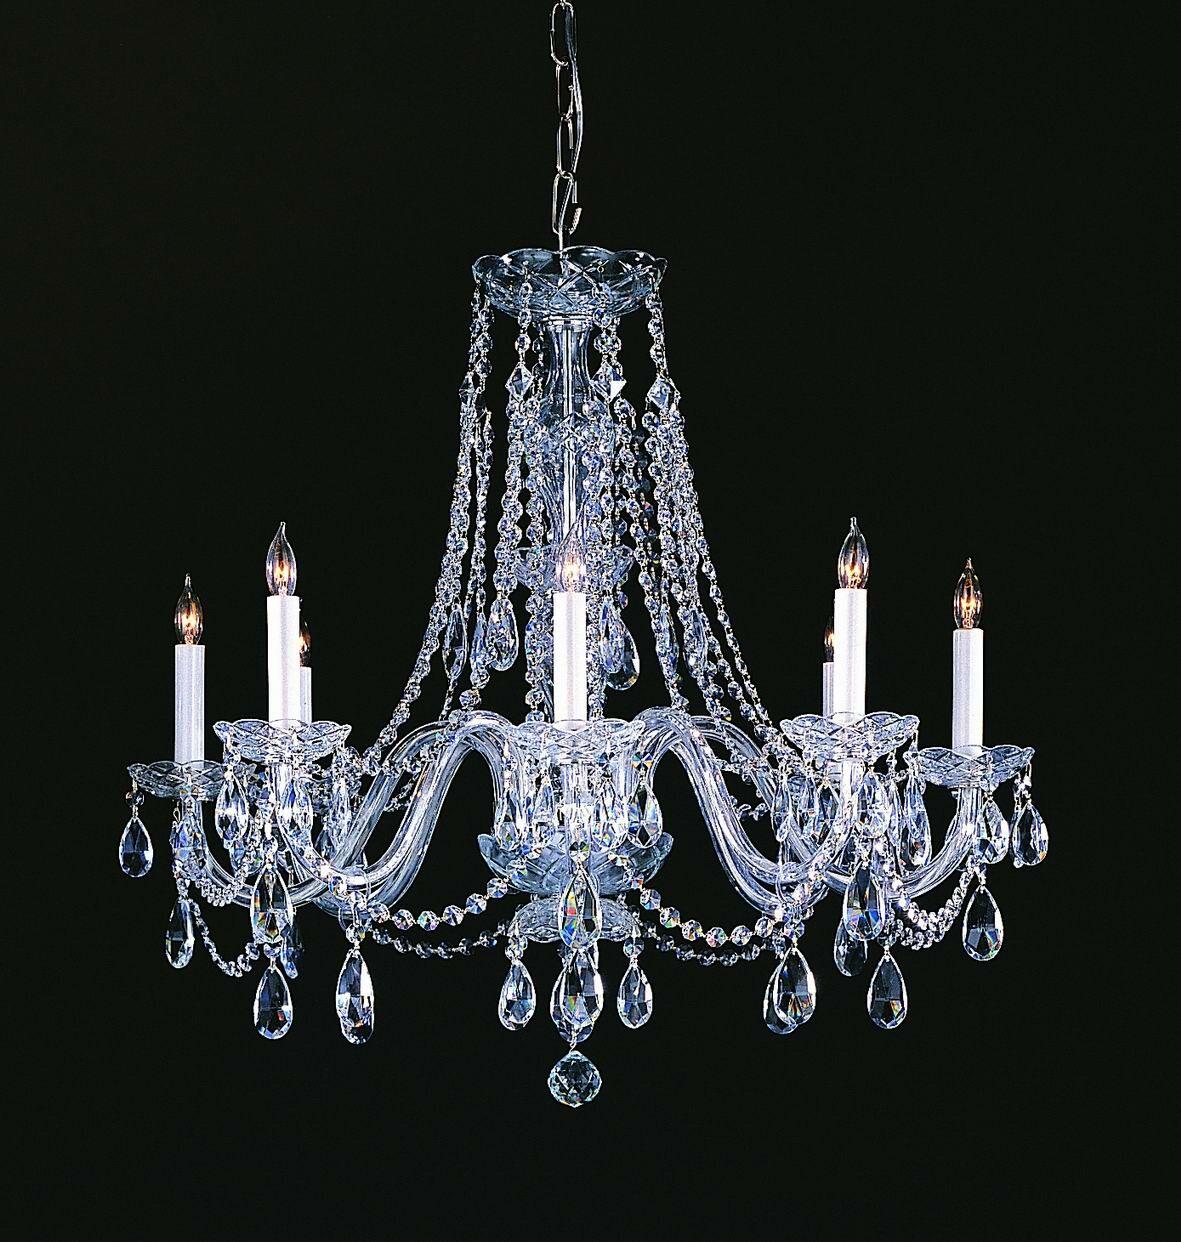 Milan 8-Light Candle Style Chandelier Crystal Type/Finish: Majestic Wood Polished/Chrome